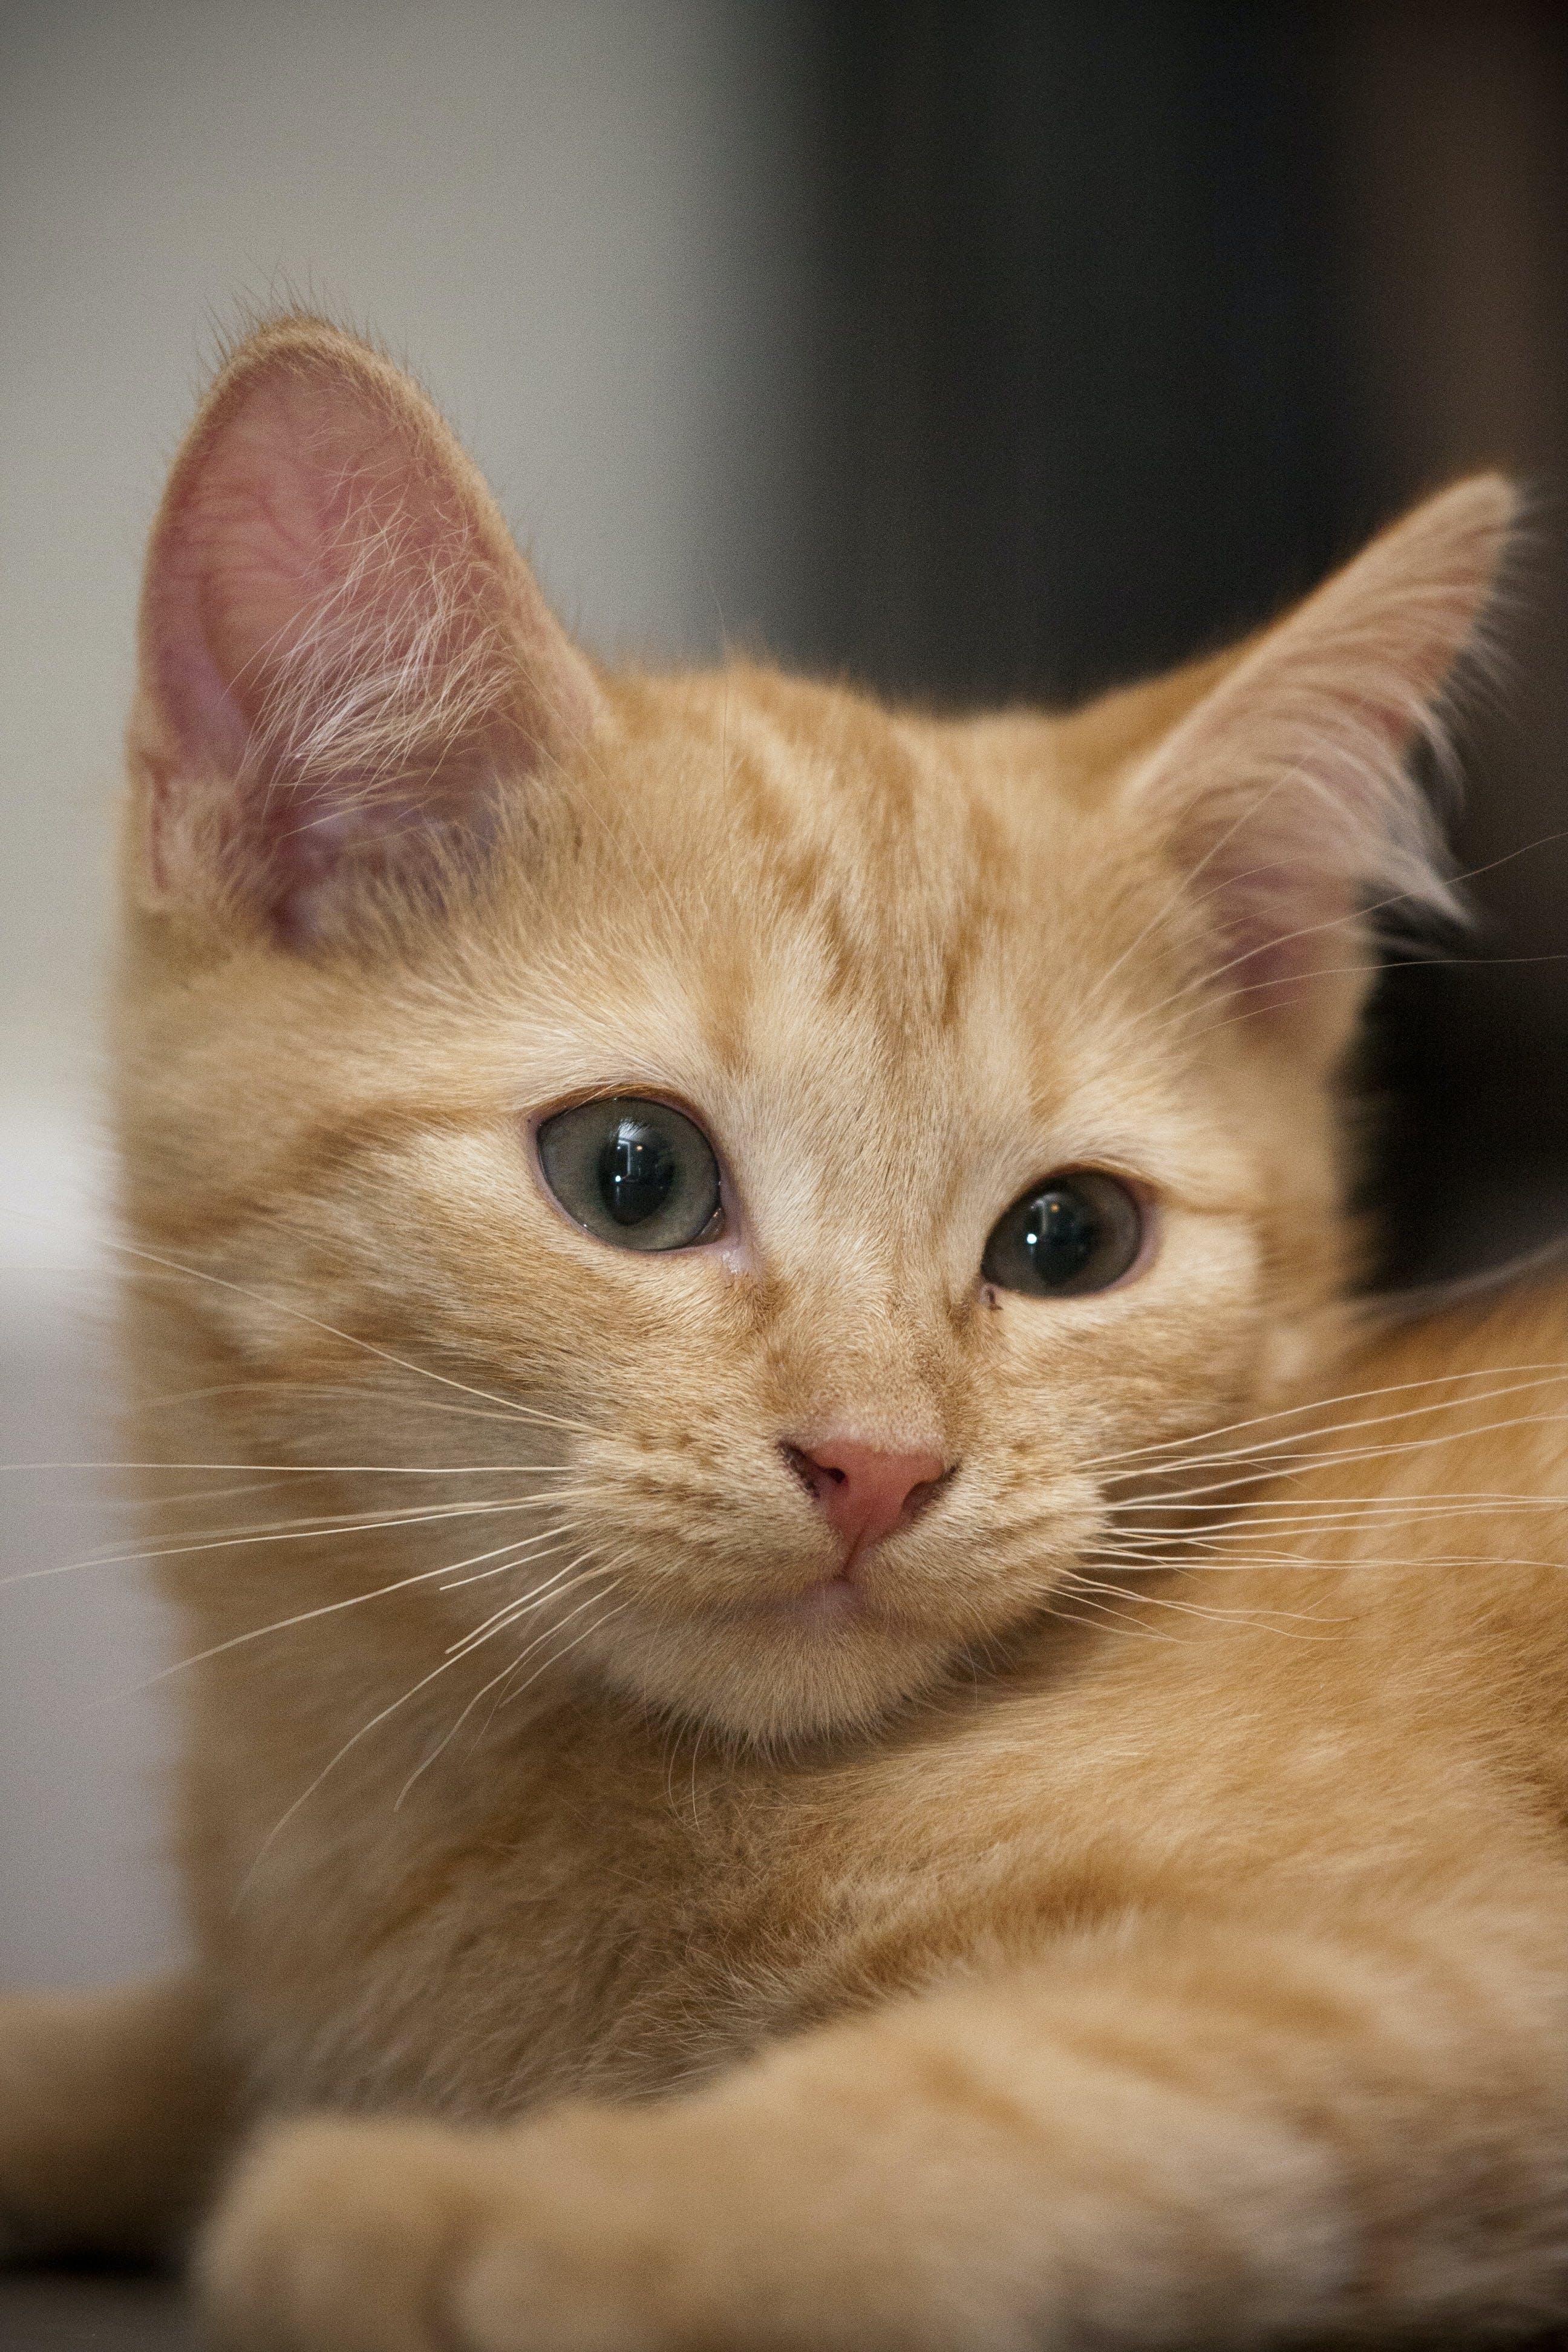 Free stock photo of cat, close up, kitten, orange